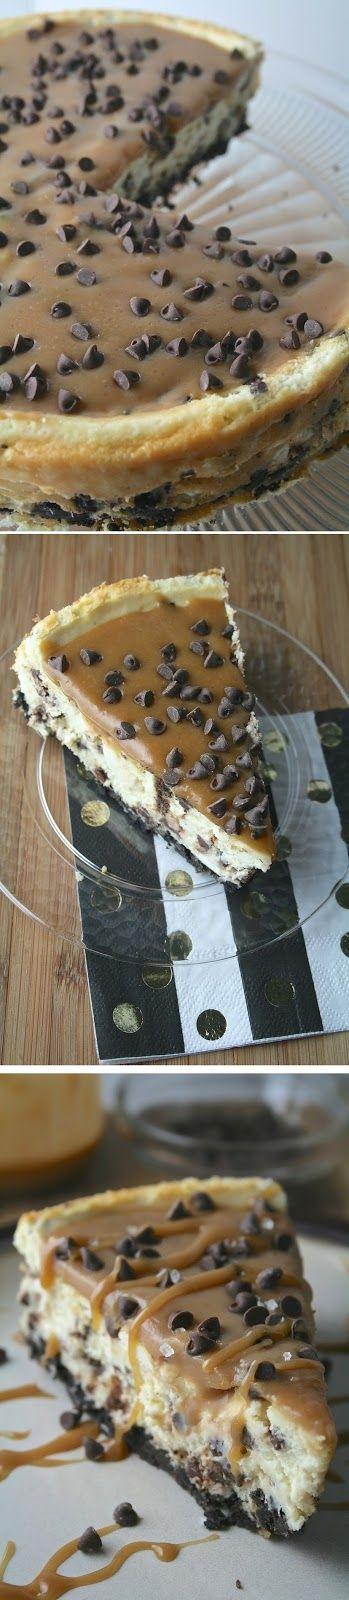 Salted Caramel Chocolate Chip Cheesecake